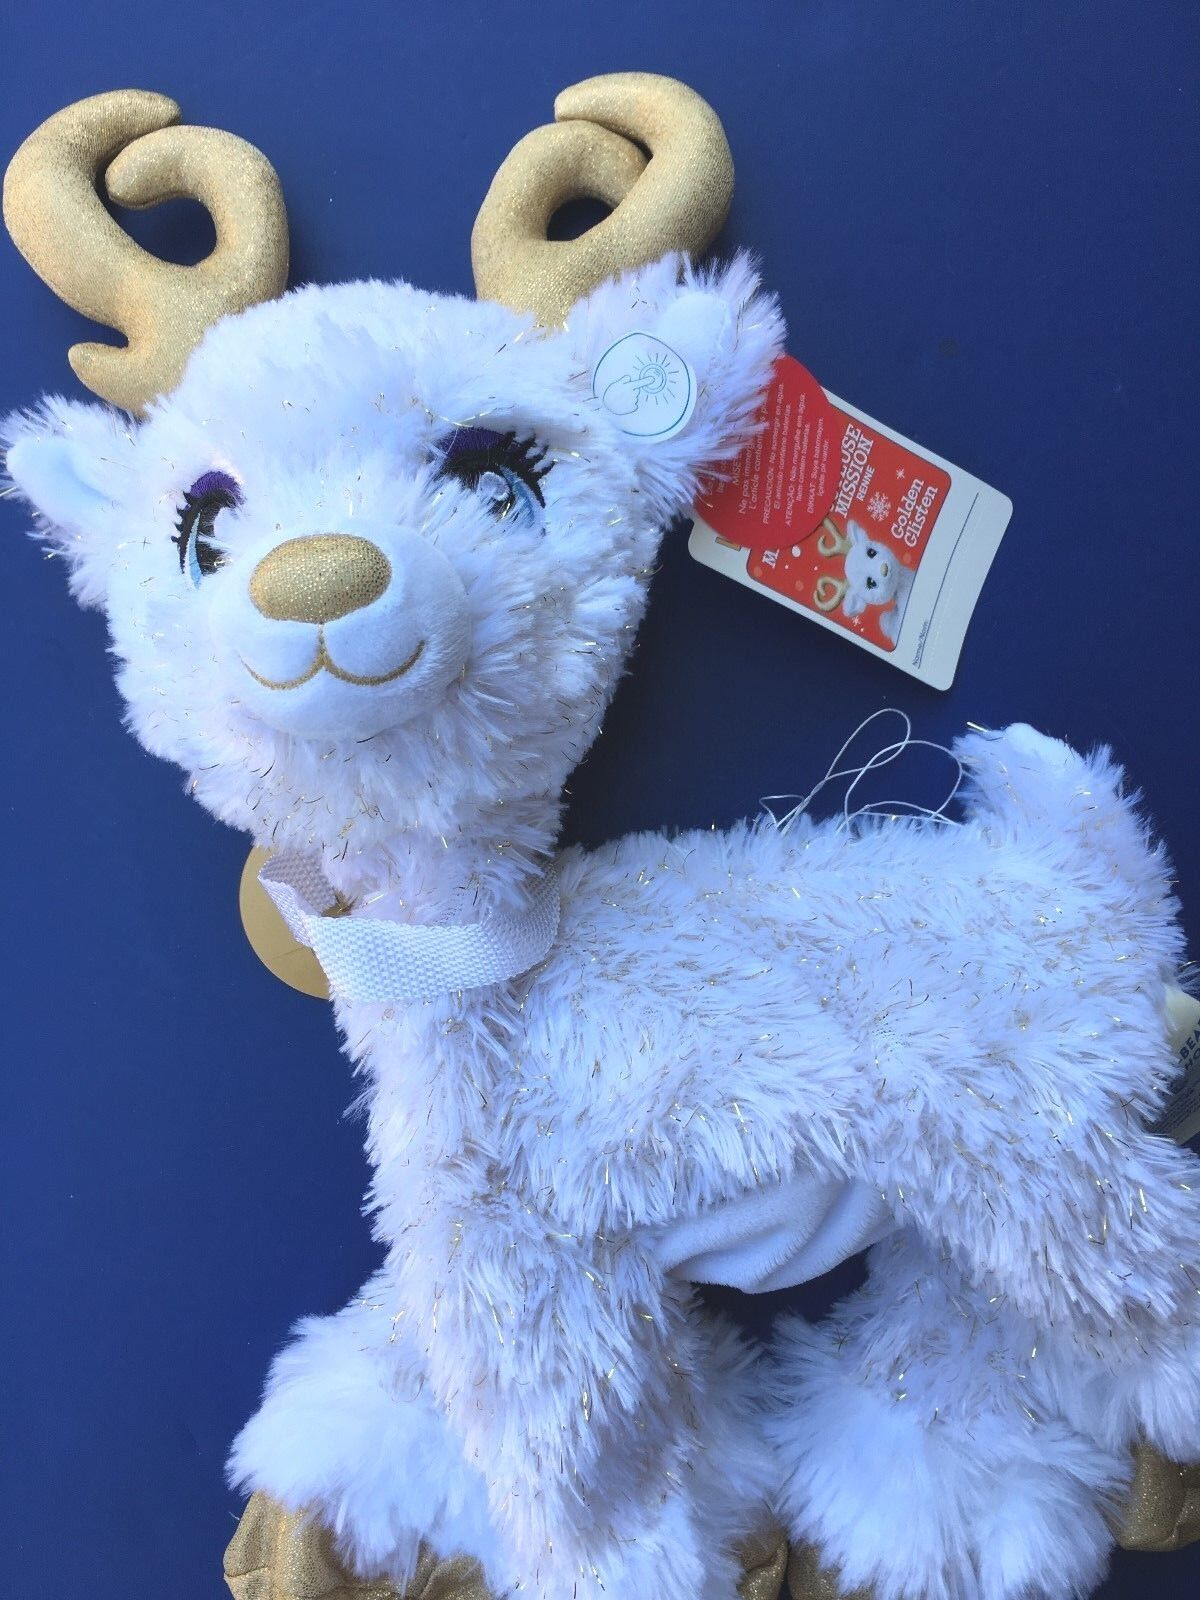 Build a Bear 15  oroen Glisten - Christmas Reindeer Plush Toy - Unstuffed-NWT